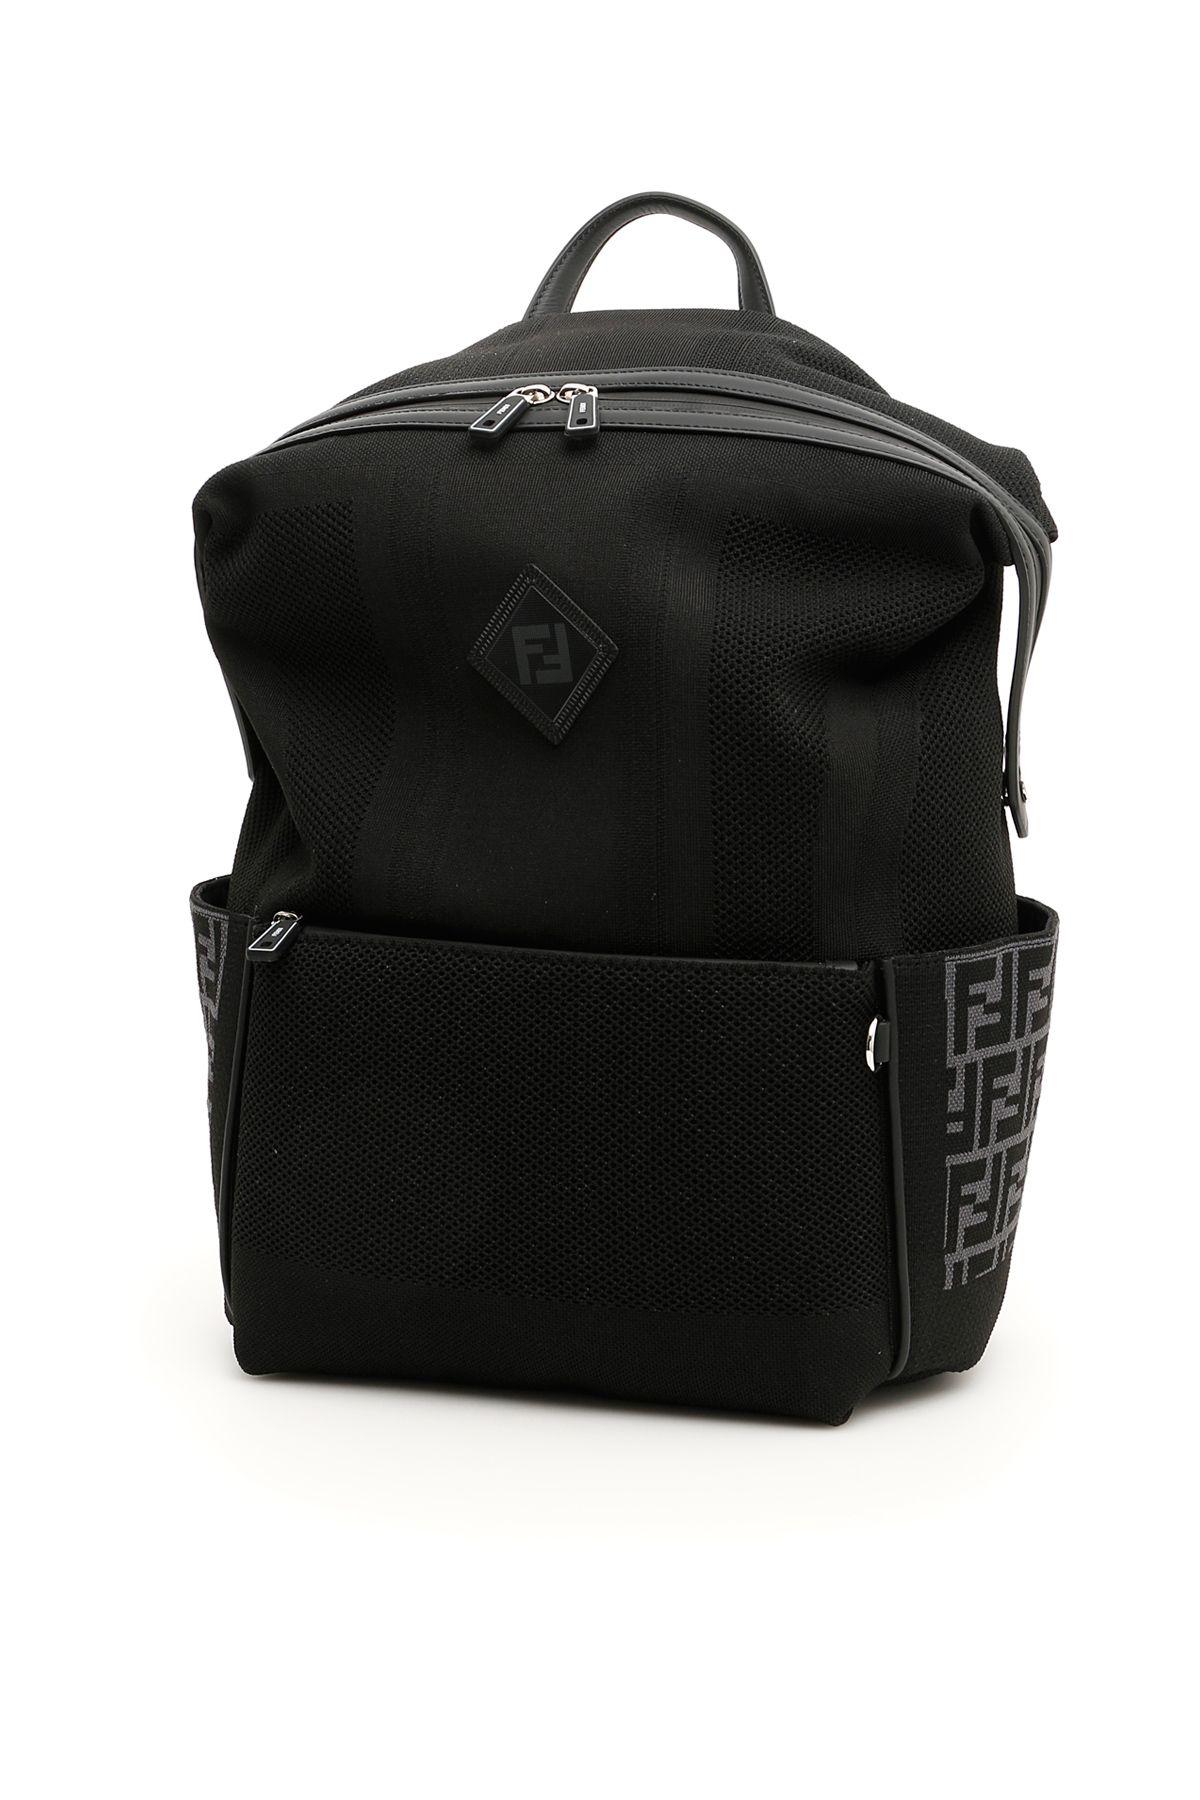 f19c4cff8f7e FENDI 黑色FF拼接背包.  fendi  bags